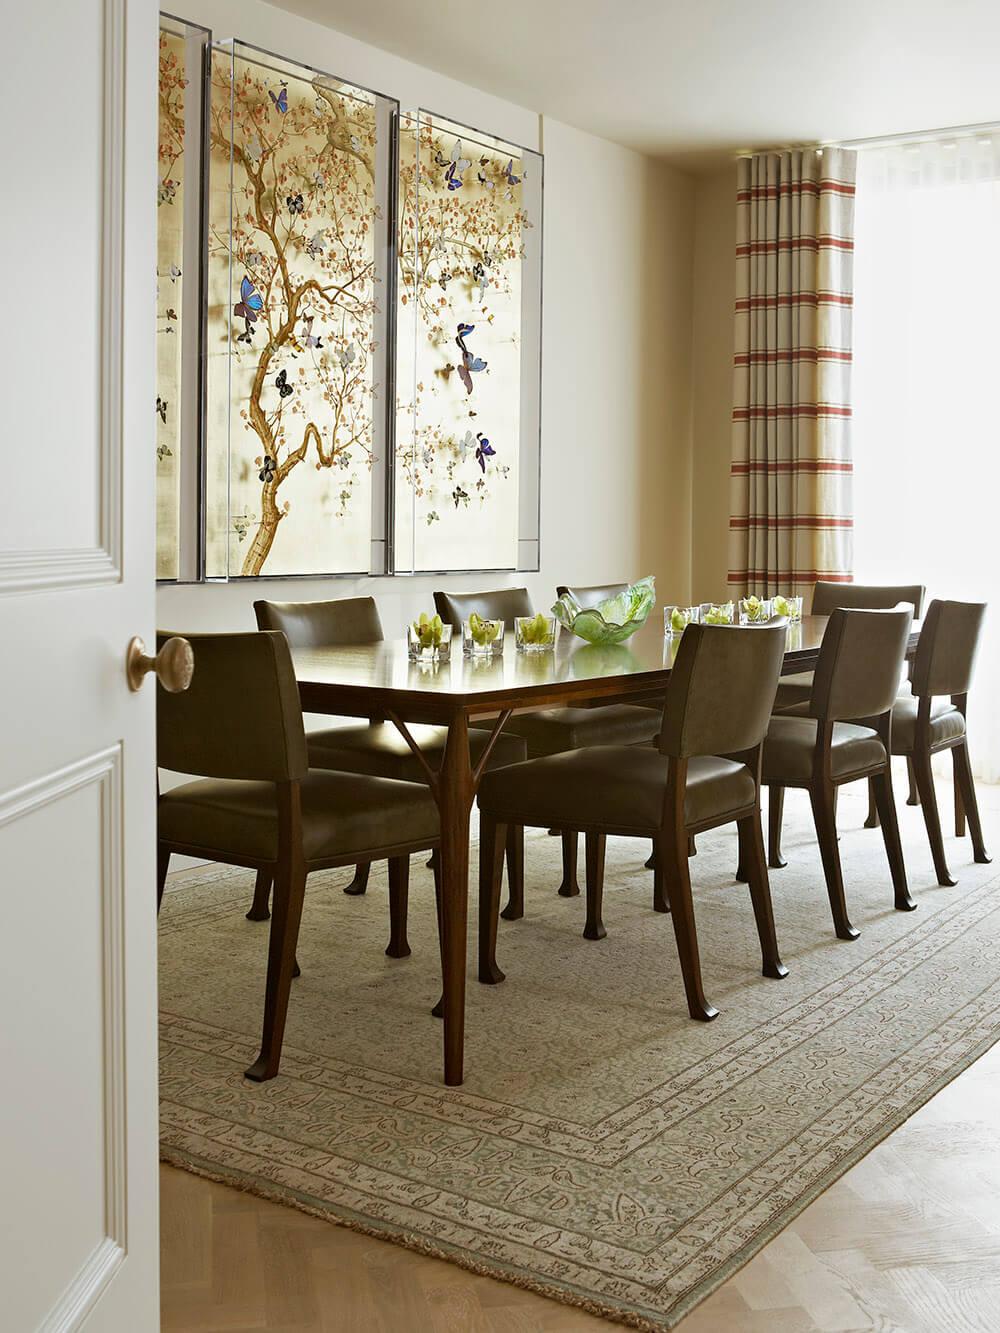 Trevor-Square-SW3-dining-room